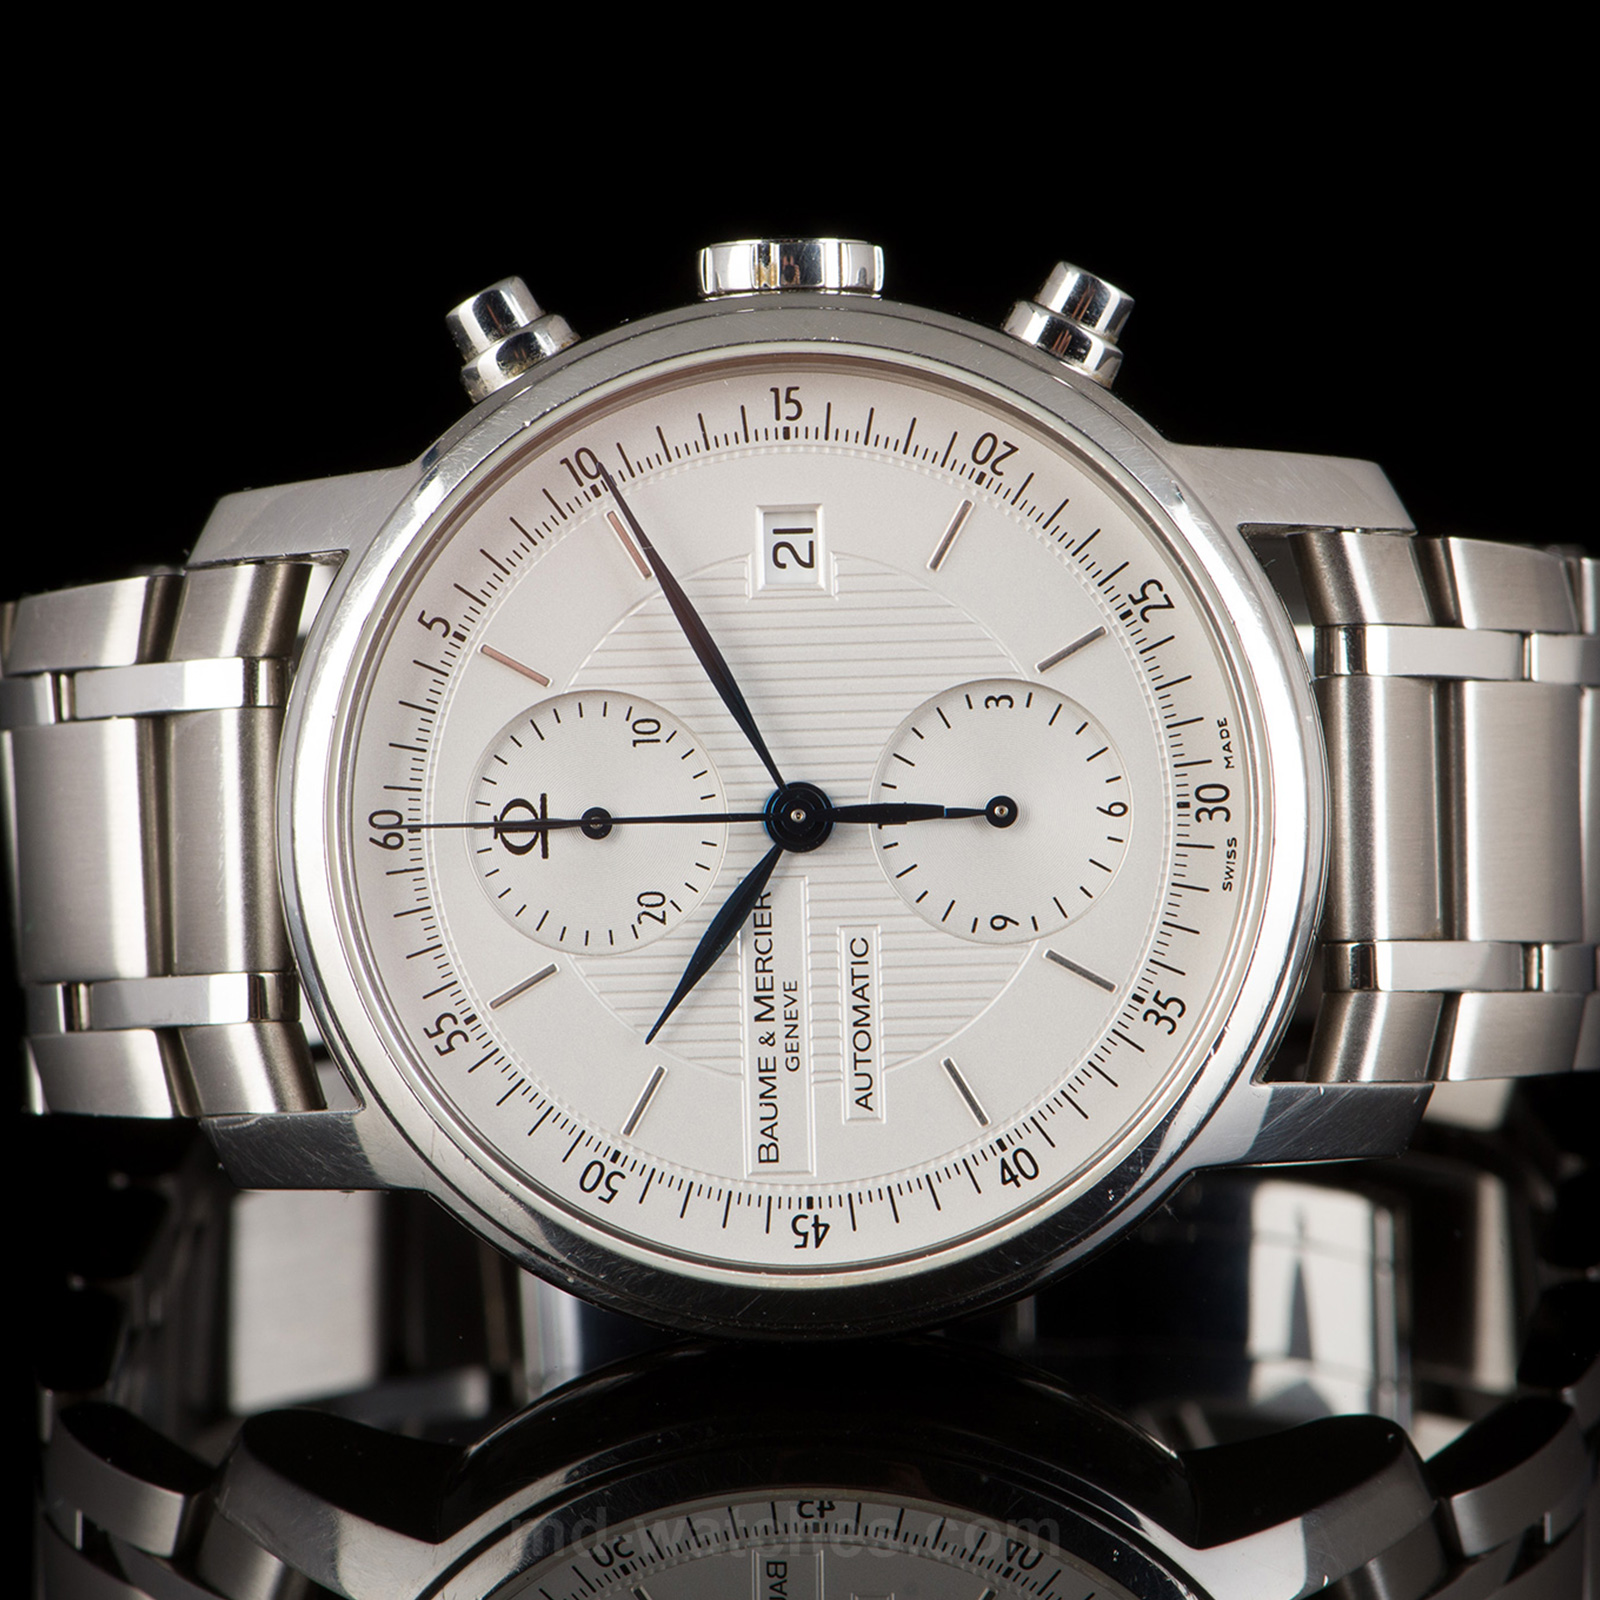 e66ef2c04c9fe4 Buy Baume & Mercier Classima XL Chronograph Automatic Ref. 65591 Watches